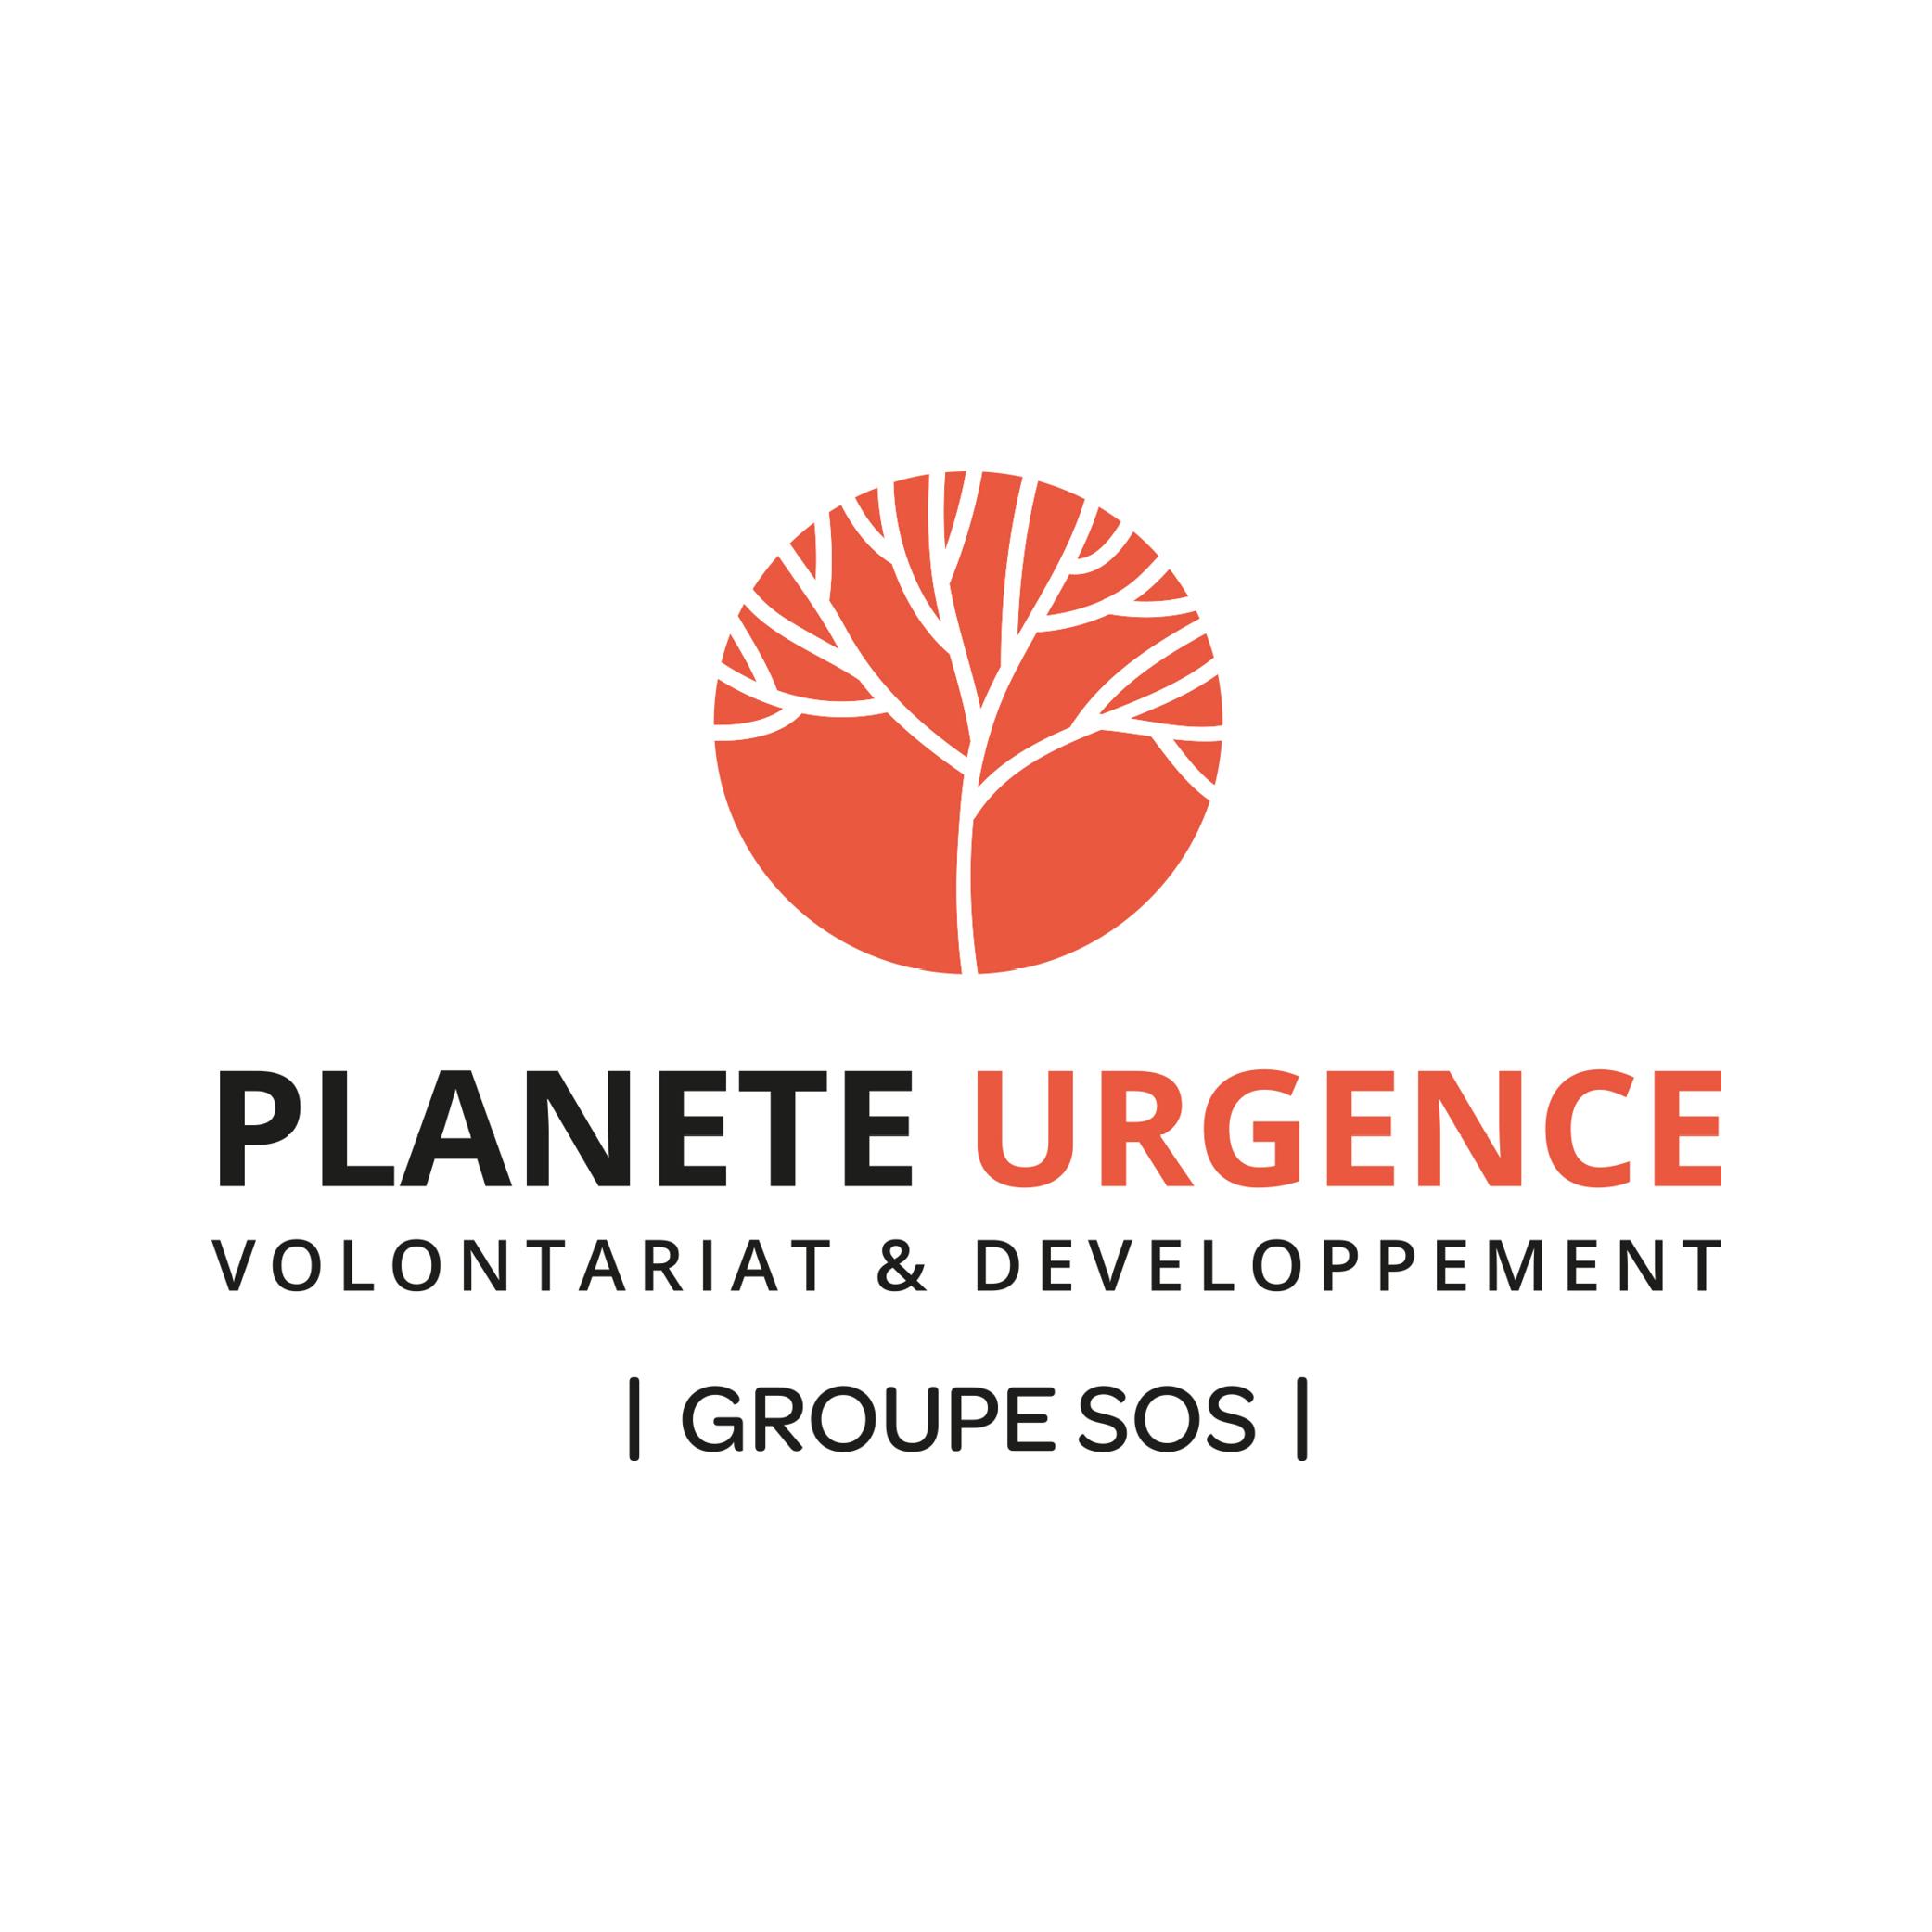 macaron_planete-urgence_web.png